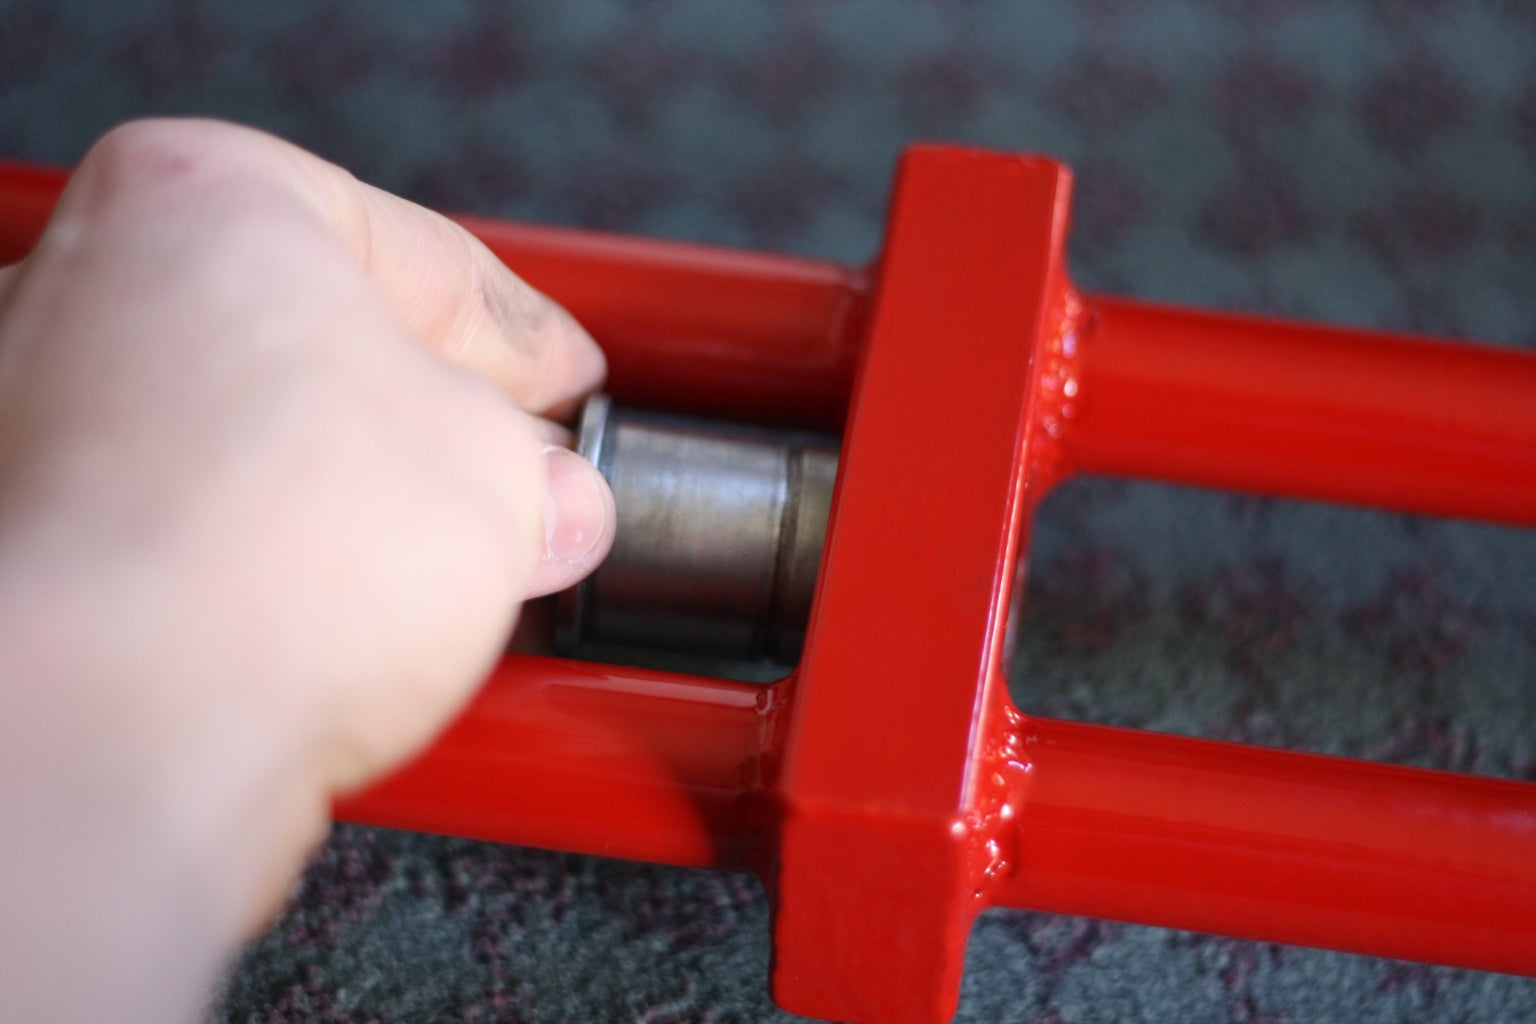 Install the Bearings